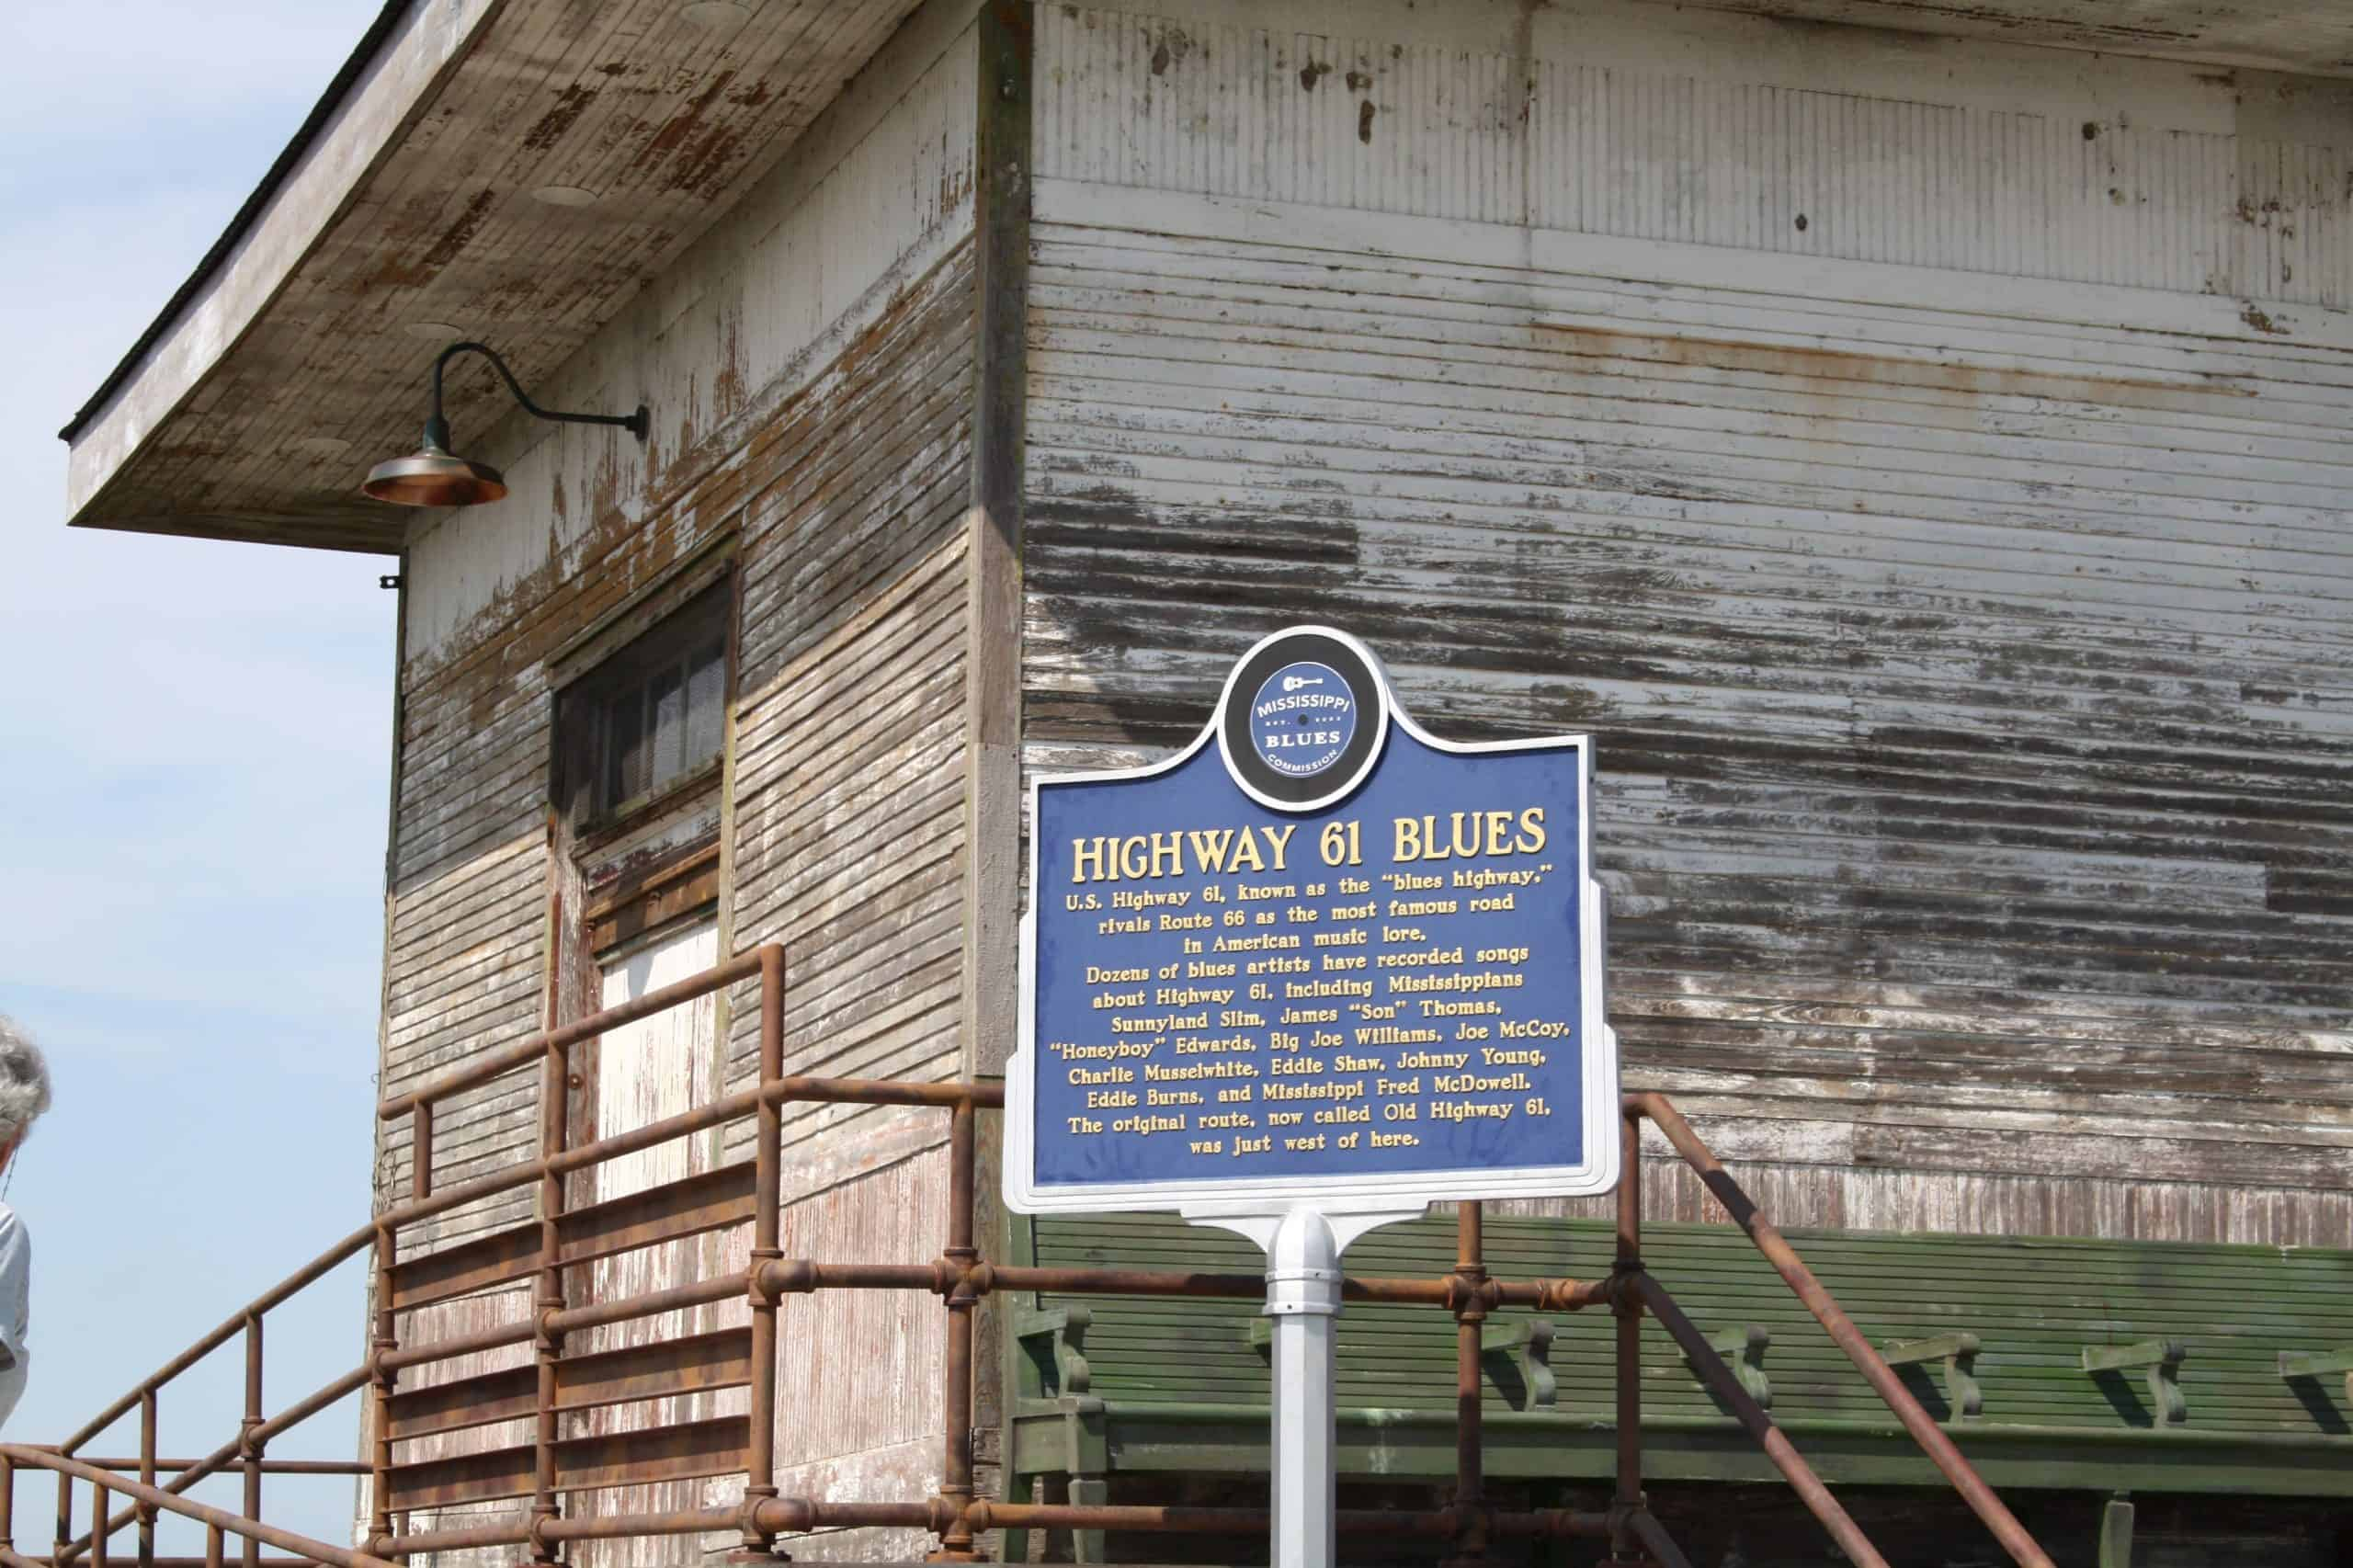 Mississippi Blues Trail sign marking Highway 61